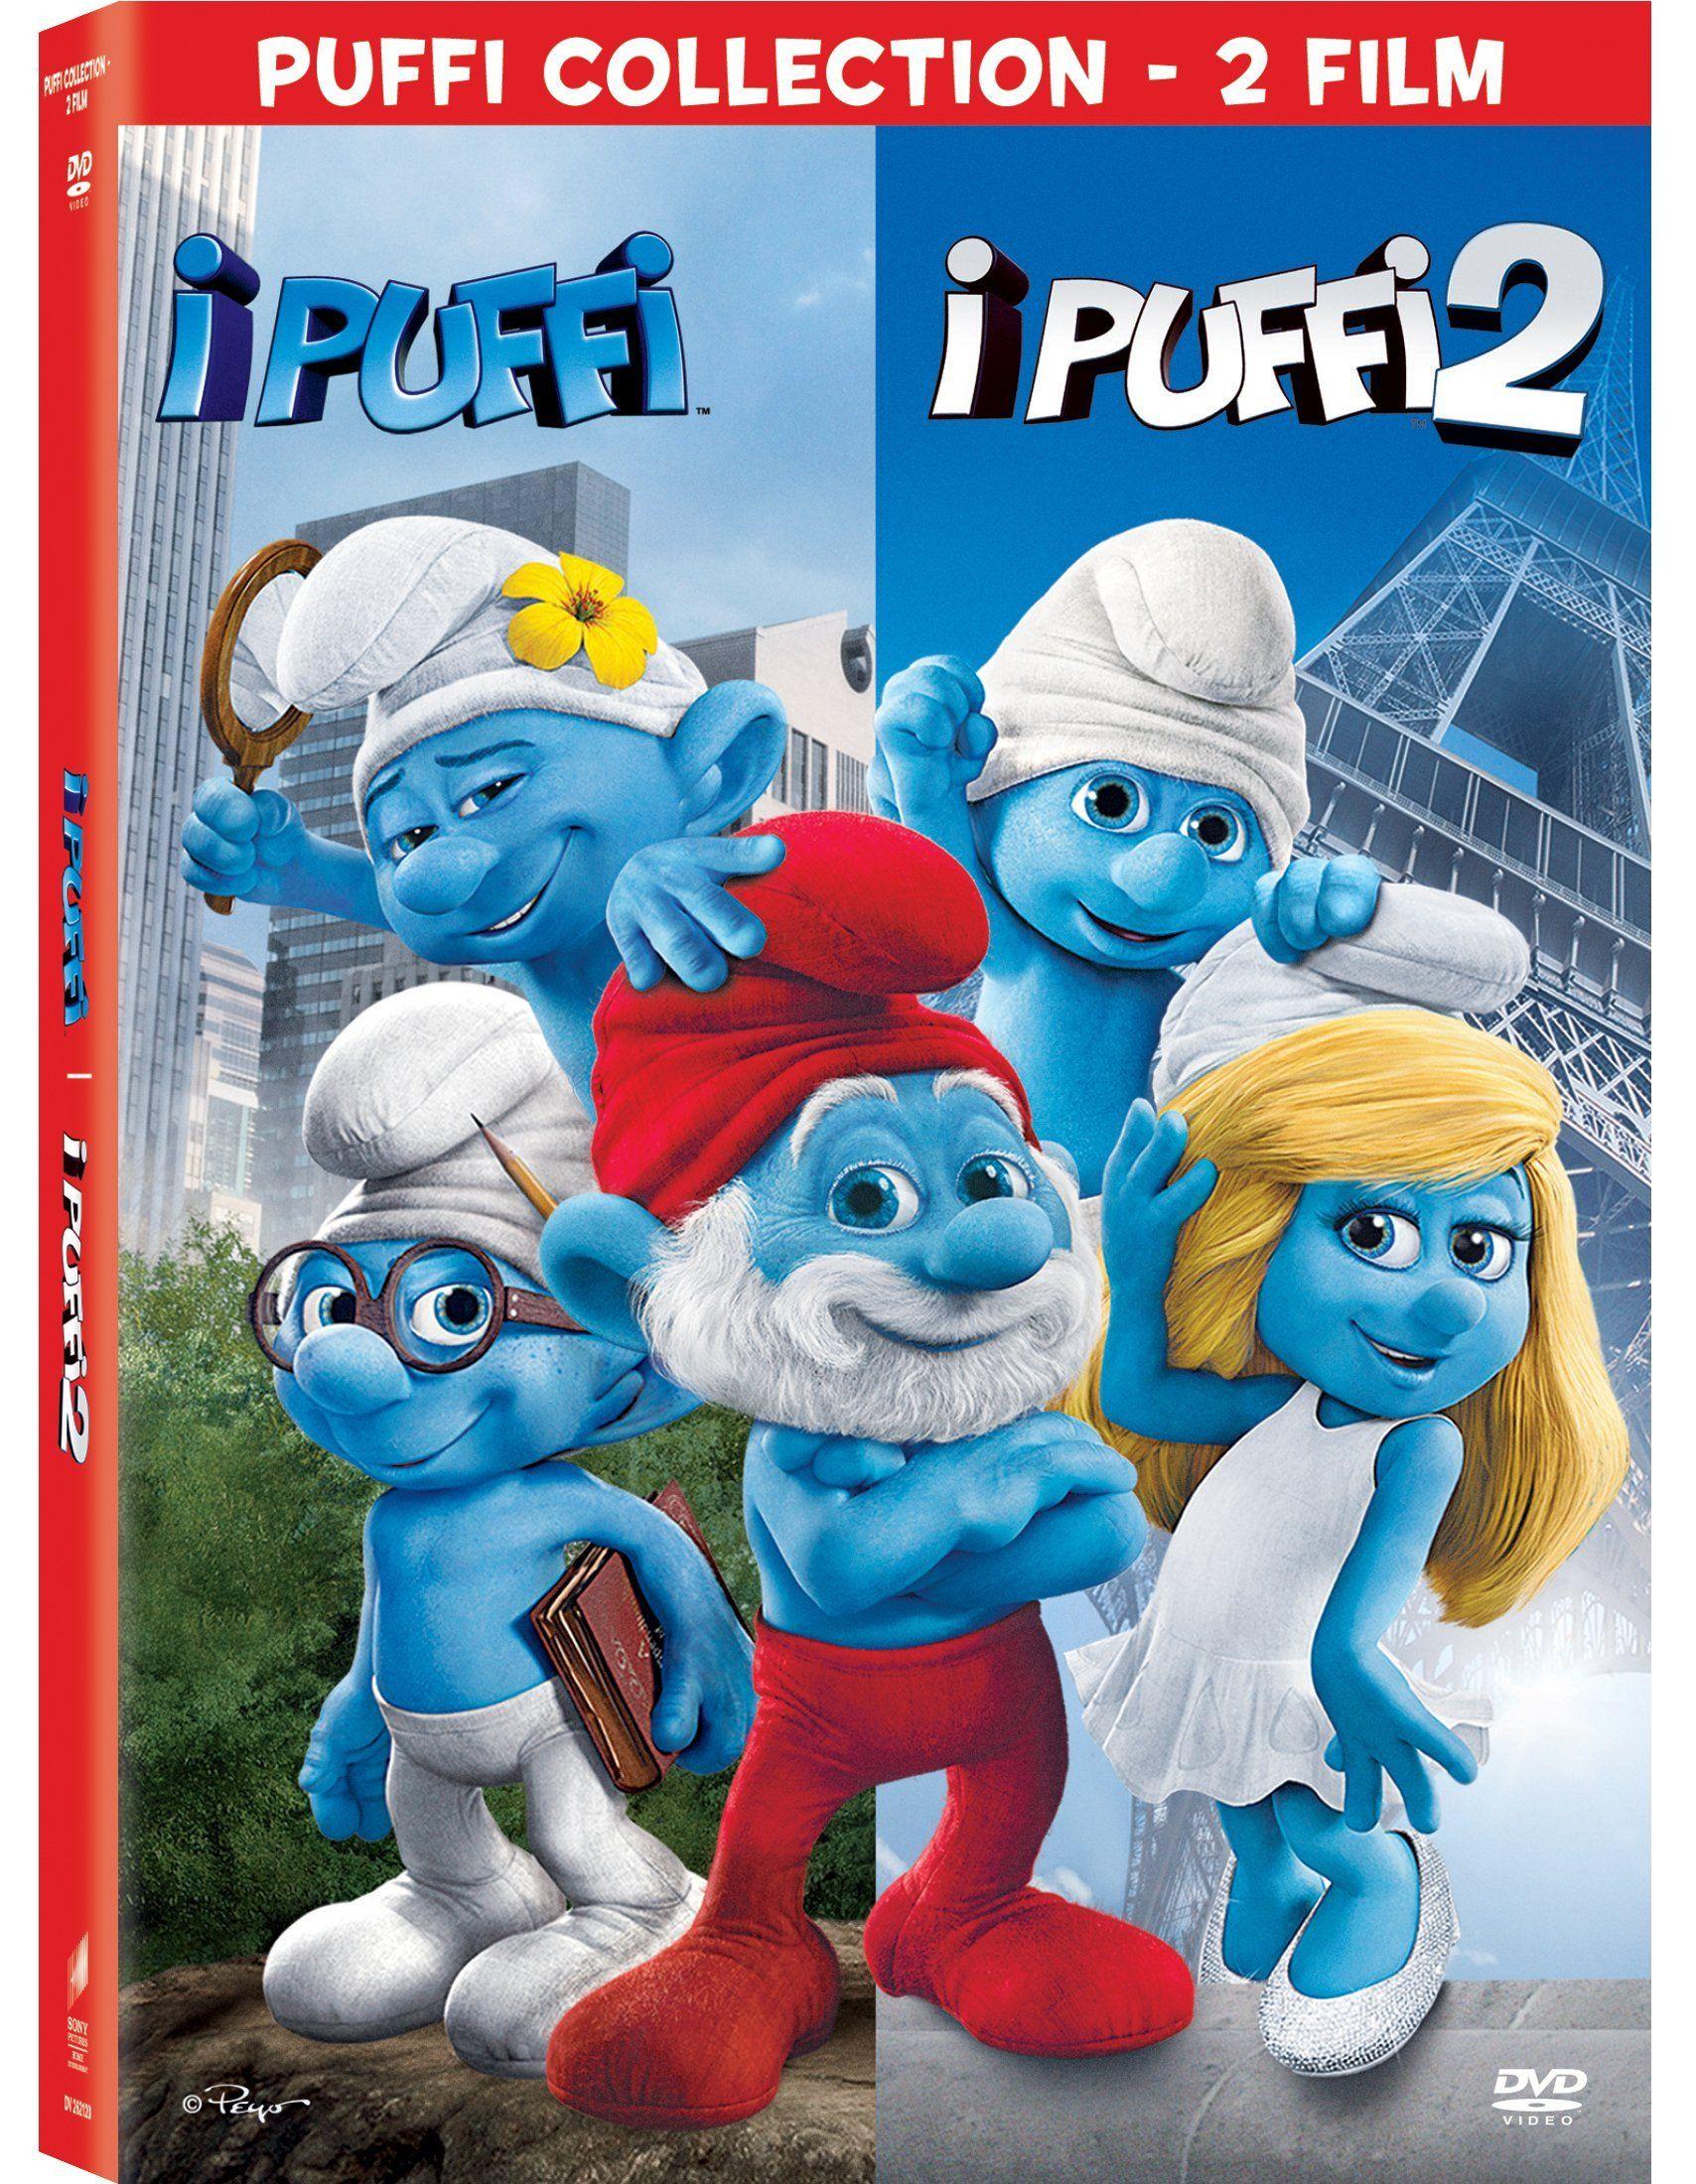 I Puffi Collezione 2 DVD) Collezione, Puffi